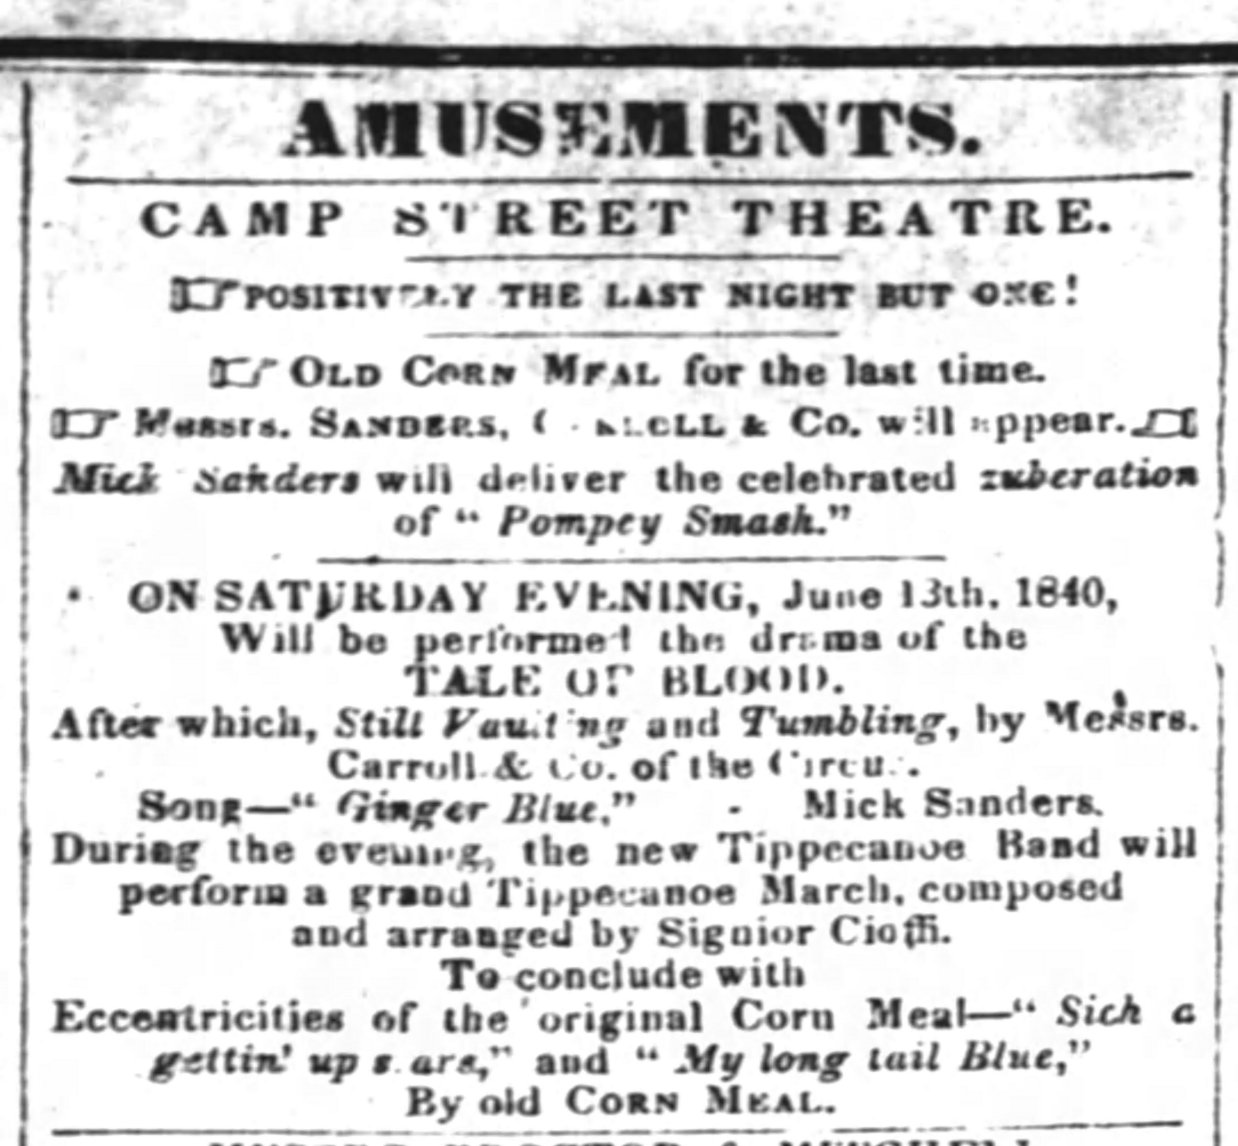 The_Times_Picayune_Sat__Jun_13__1840_TheaterLast